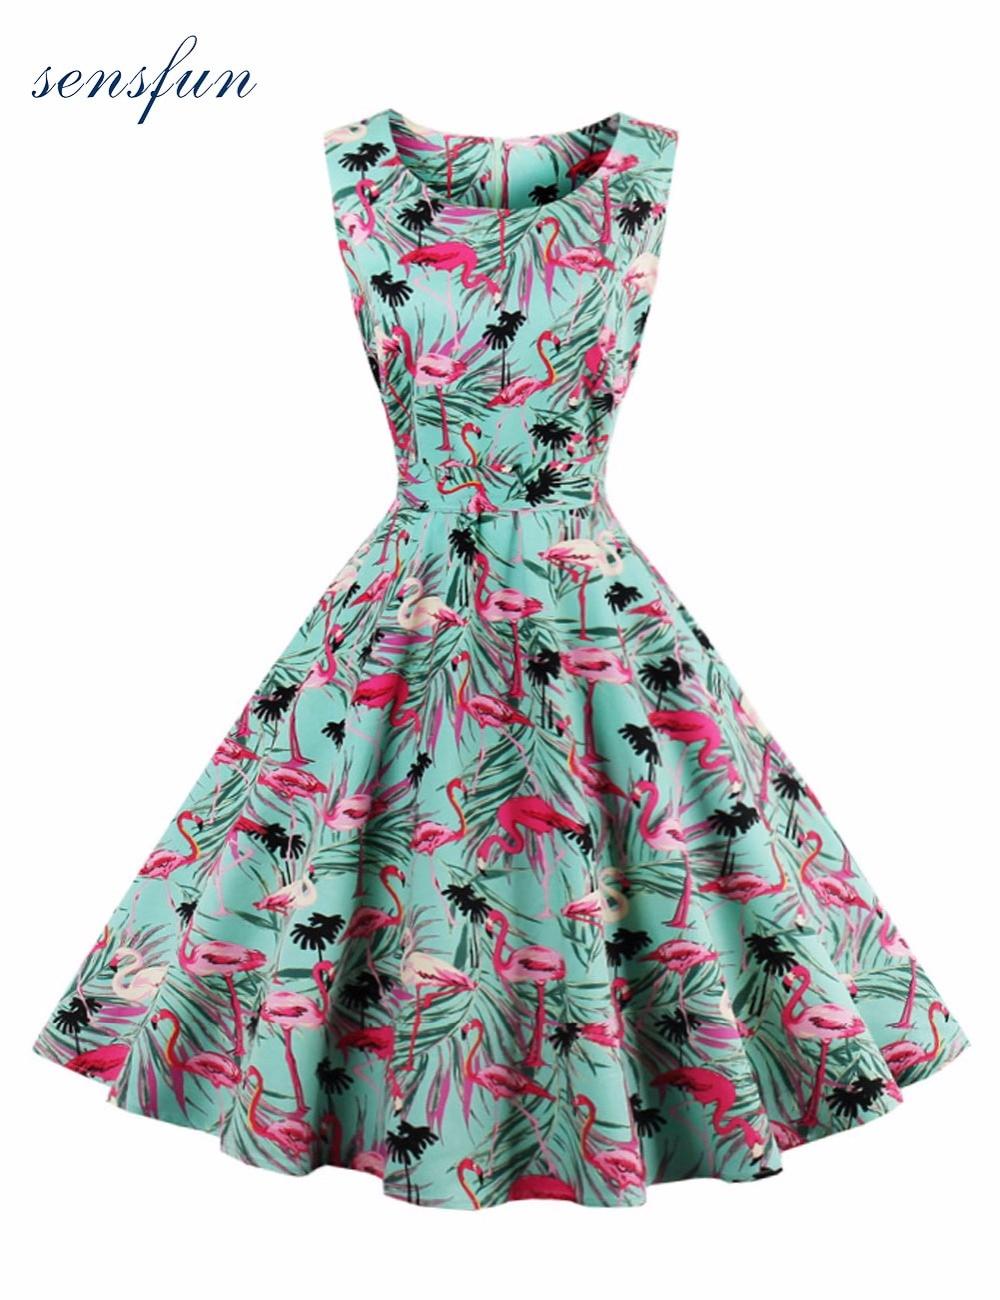 Sensfun Summer Dress Women Cotton Floral Print 1950s 60s Vintage Dress Elegant Scoop A Line Vestido Retra Party Dresses Sundress